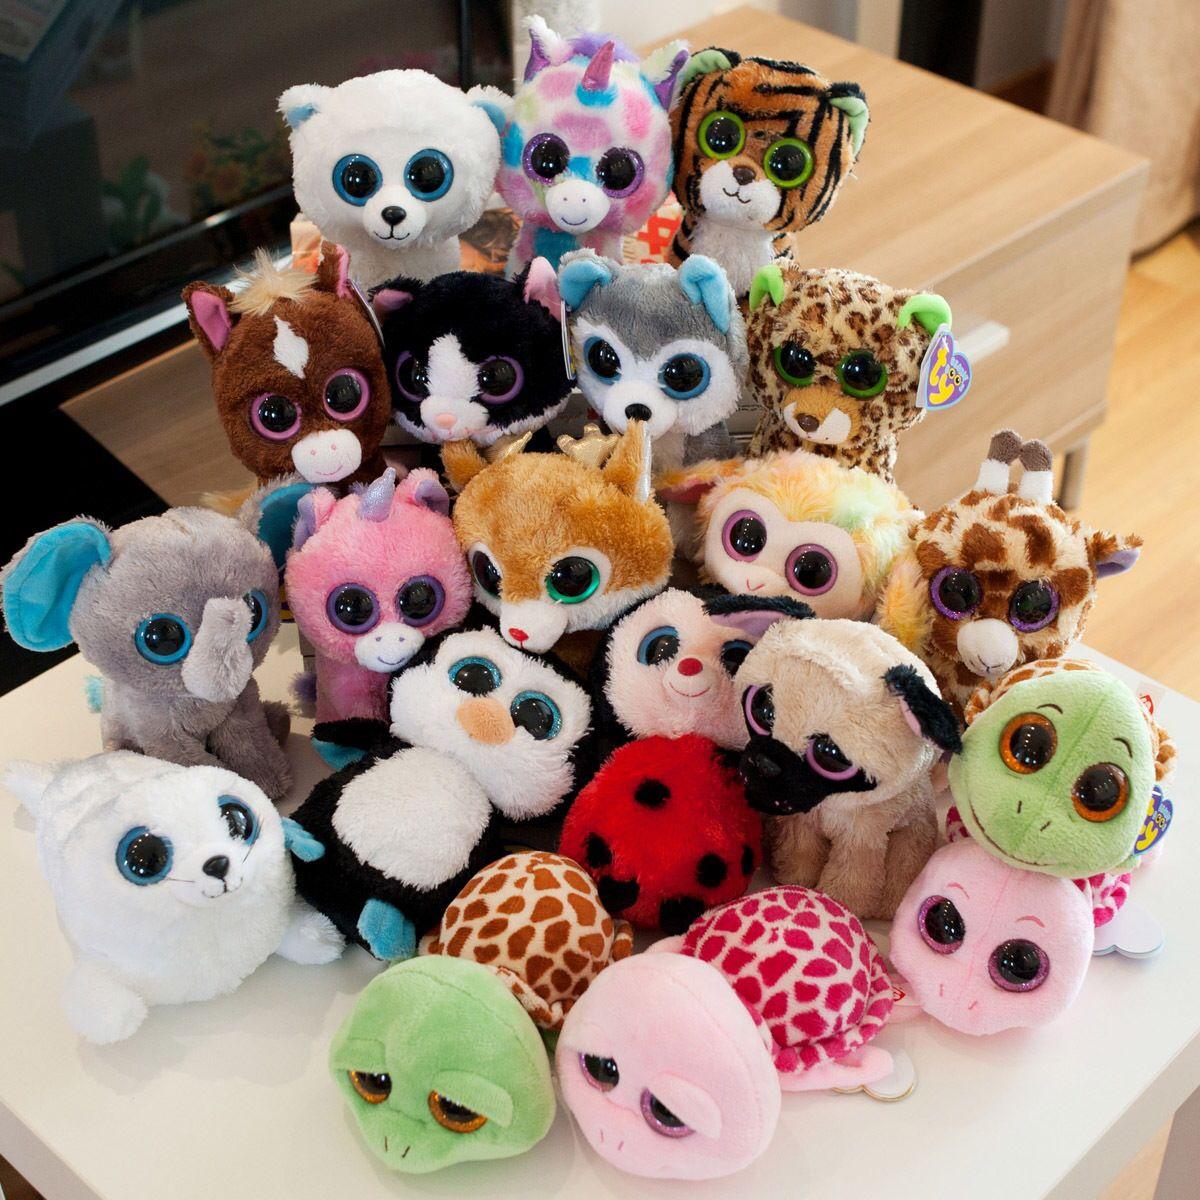 TY STUFFED ANIMALS Cute Stuffed Animals And Benni Boos